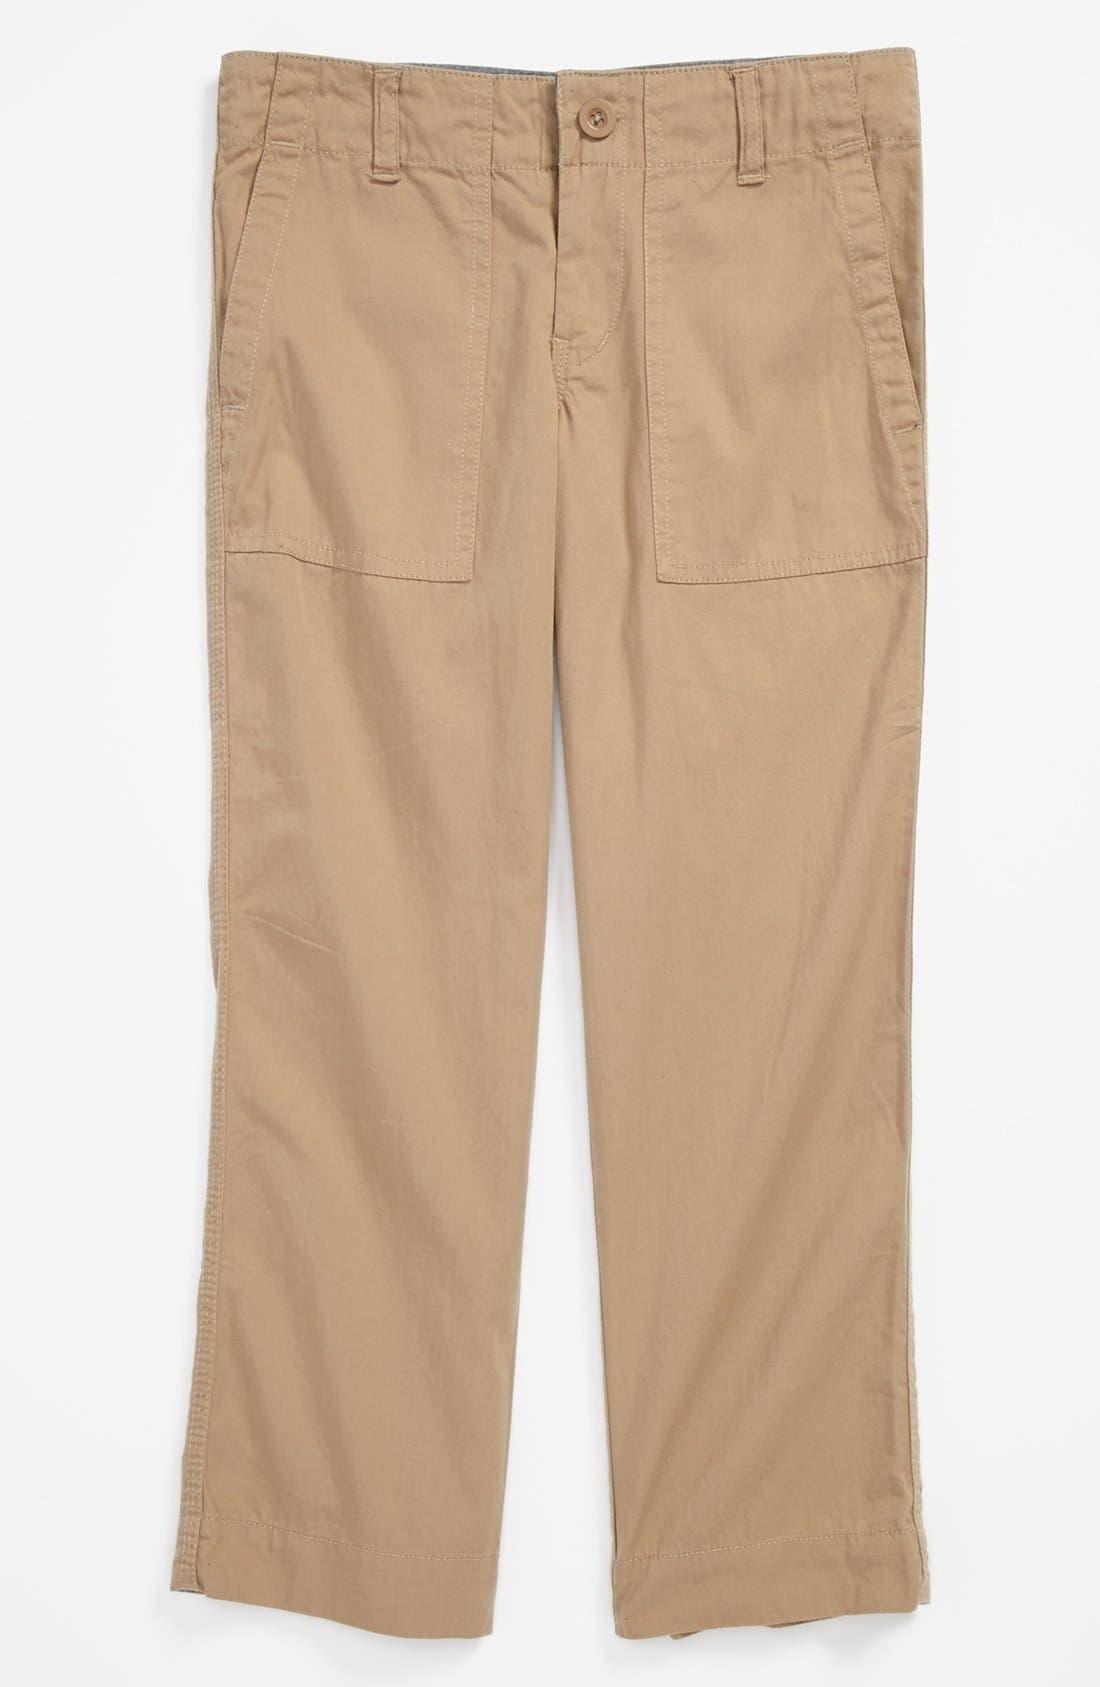 Main Image - Peek 'Tilden' Utility Pants (Big Boys)